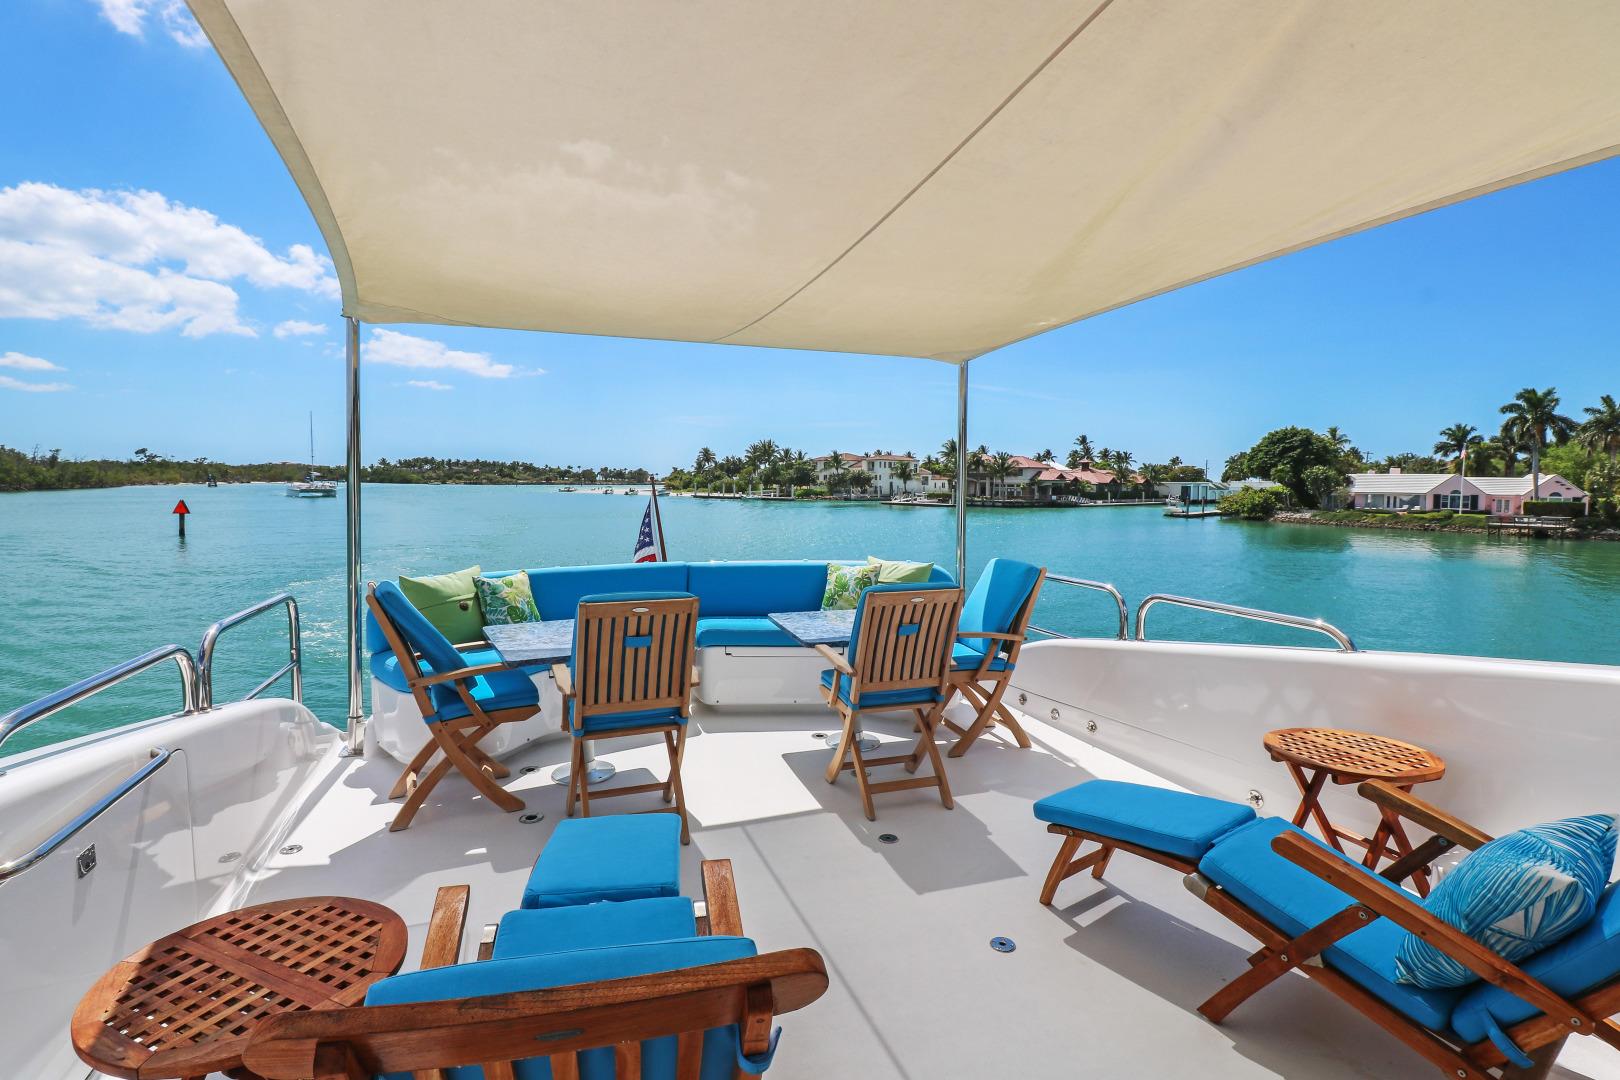 Lazzara-Sky Lounge 2002-Sea Bear Florida-United States-1419733   Thumbnail